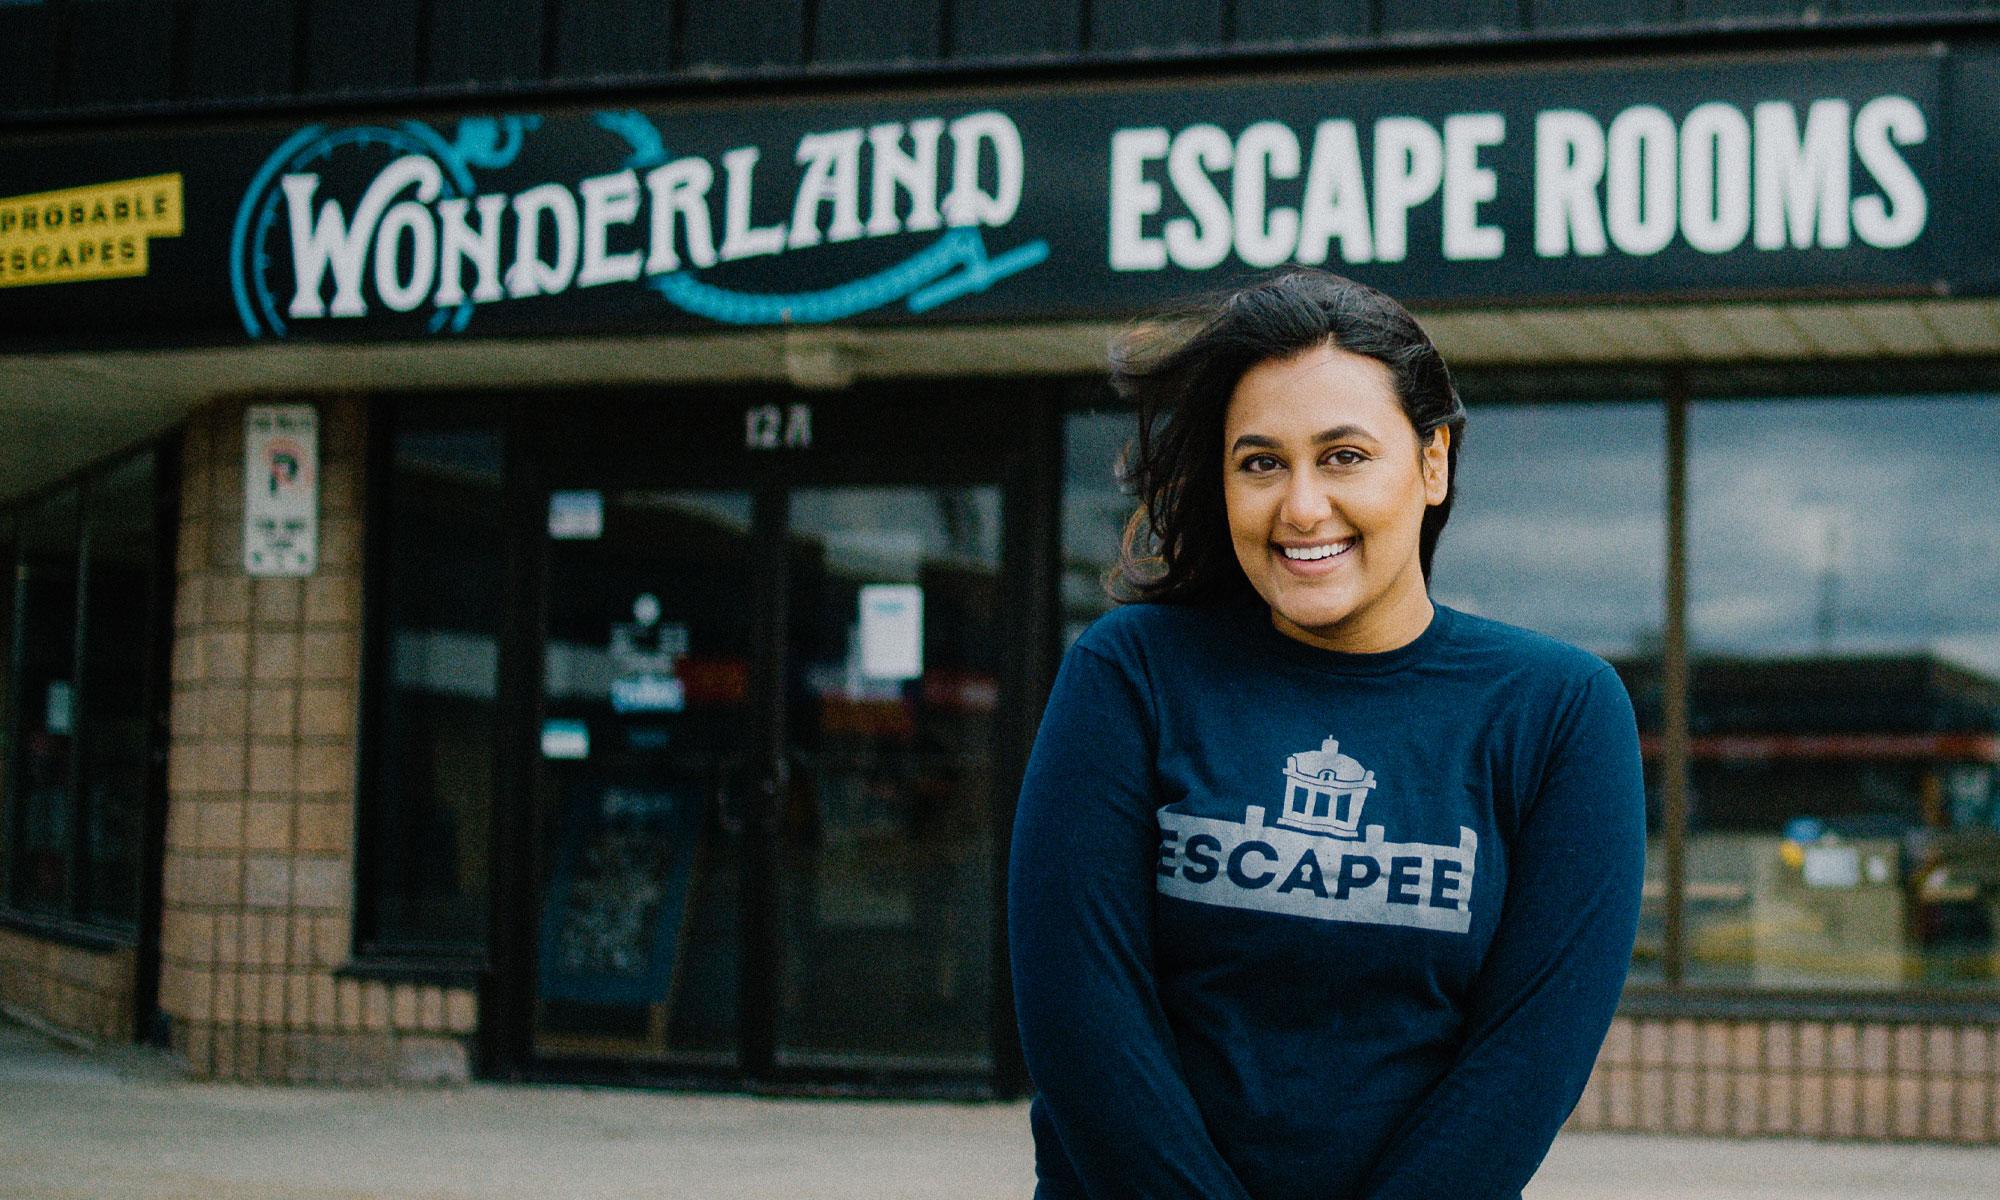 wonderland-escape-rooms